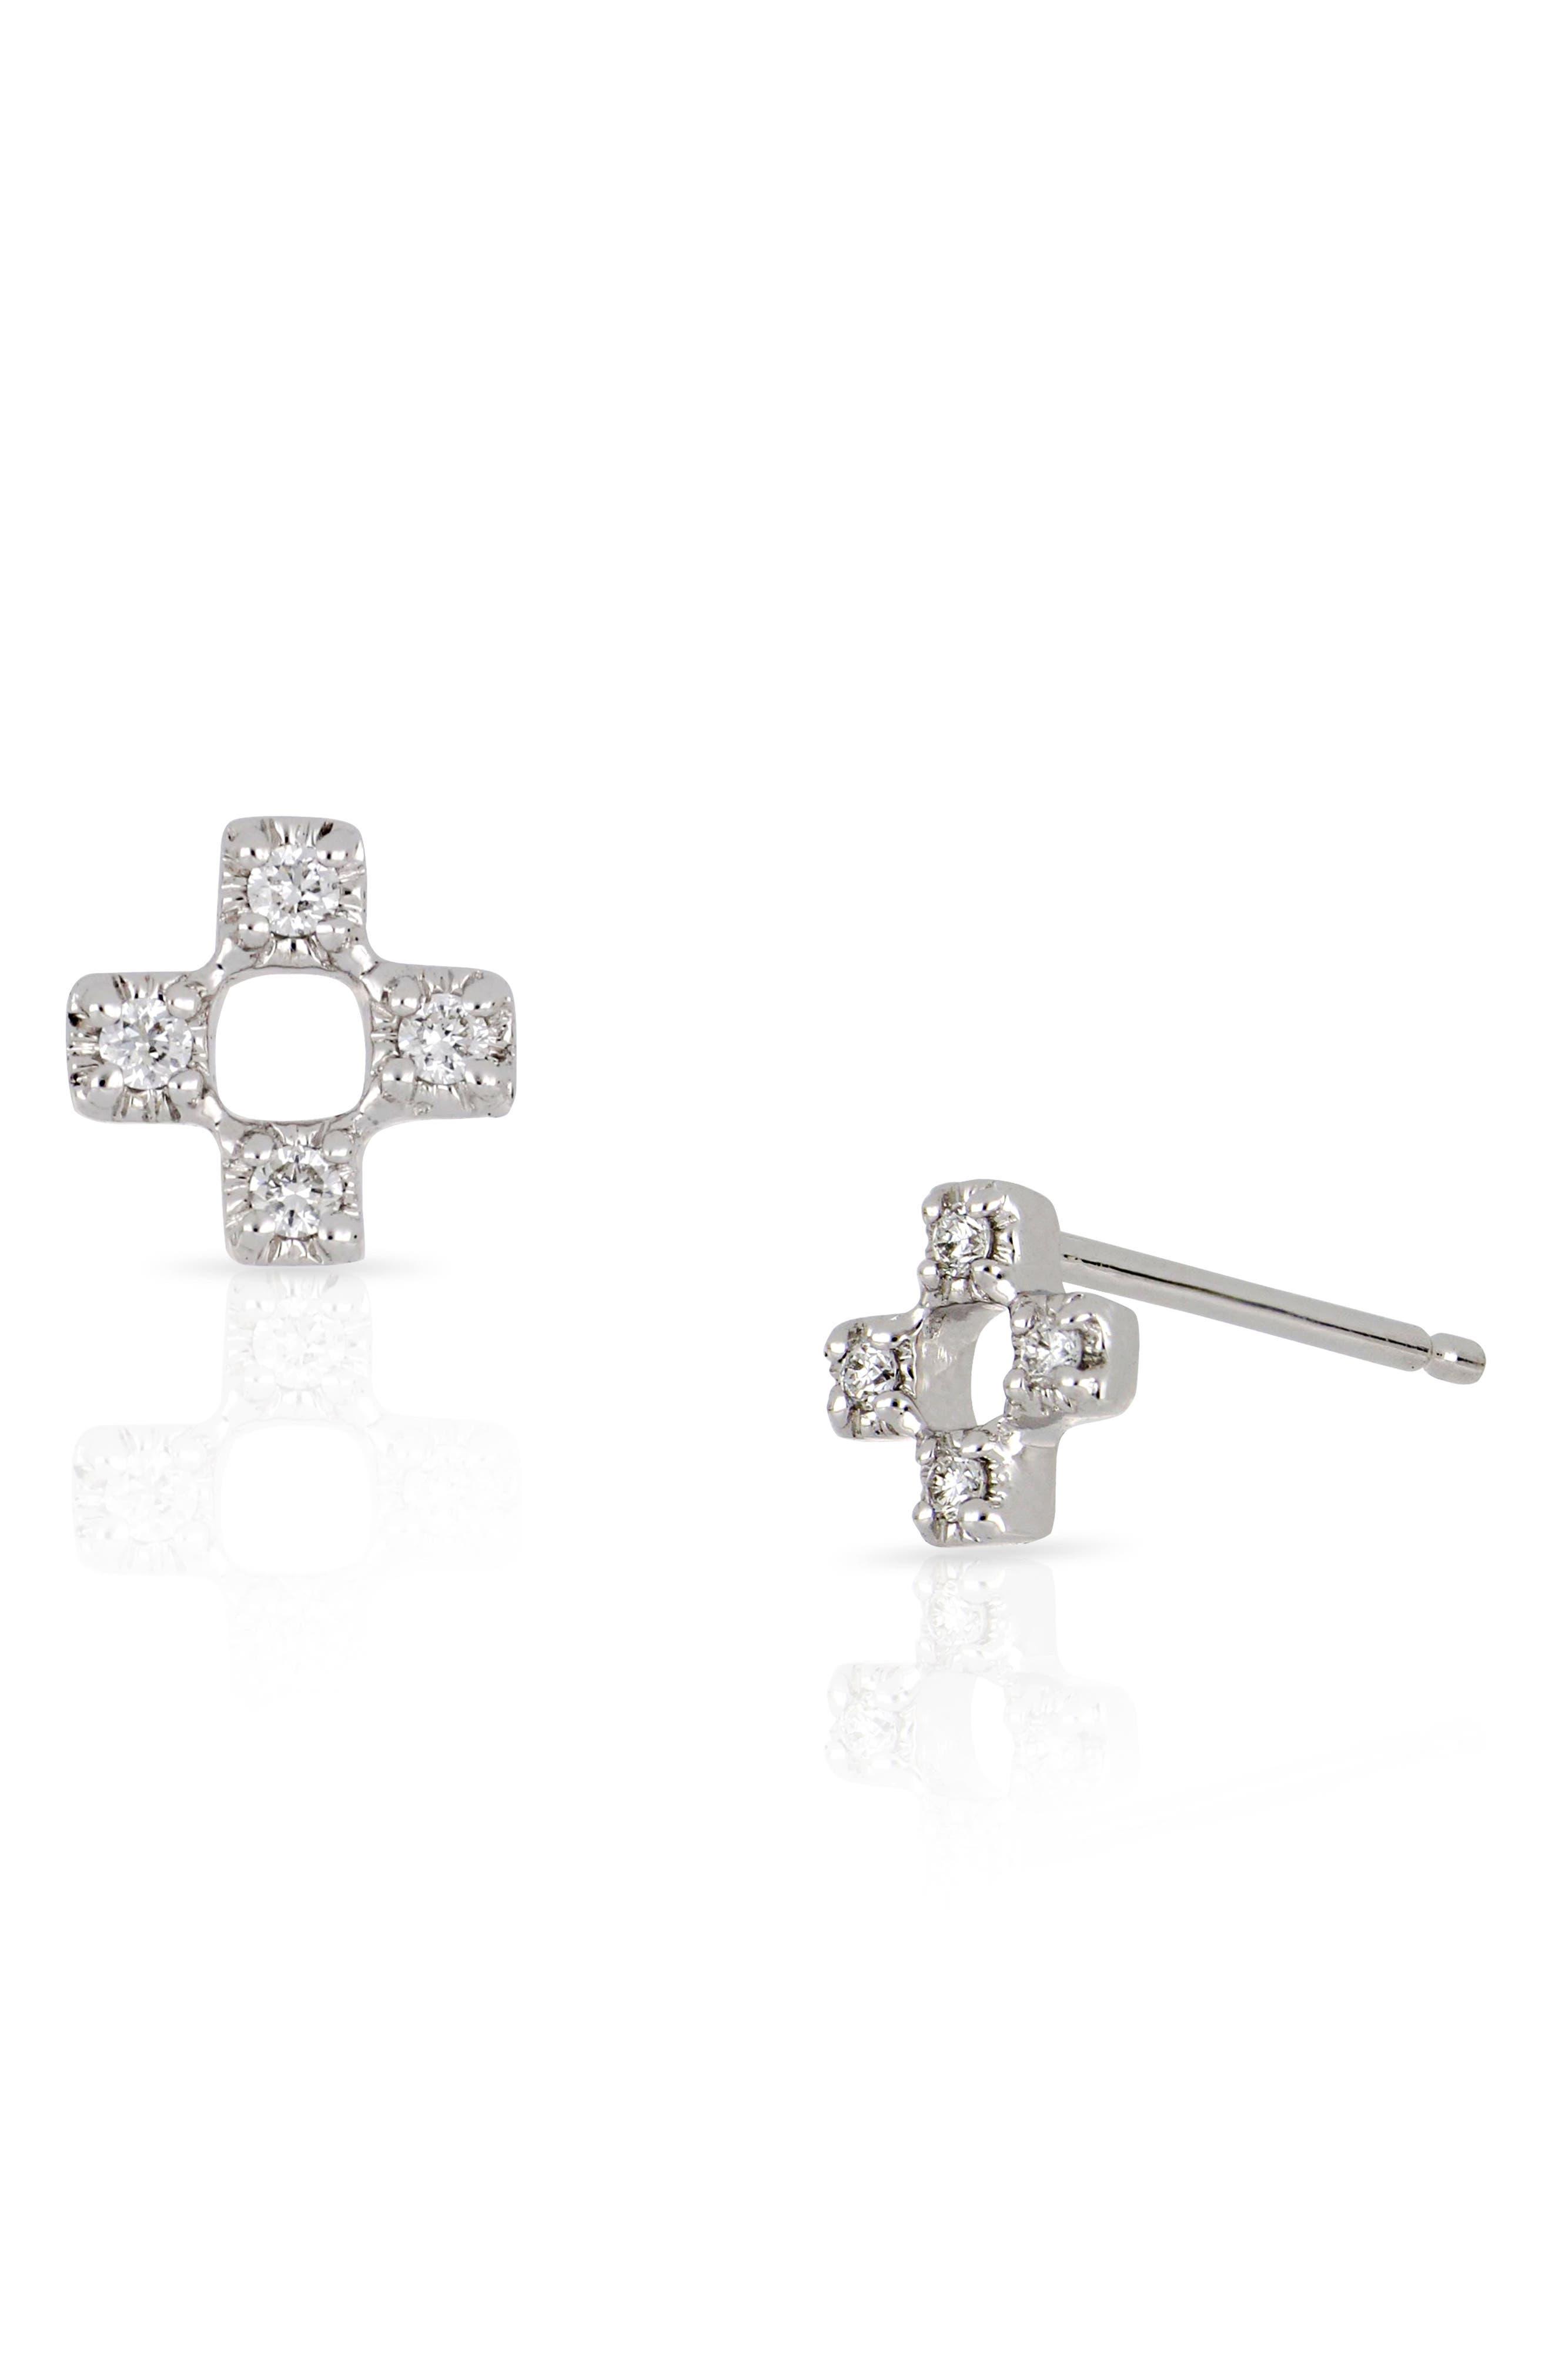 Open Square Diamond Earrings,                         Main,                         color, White Gold